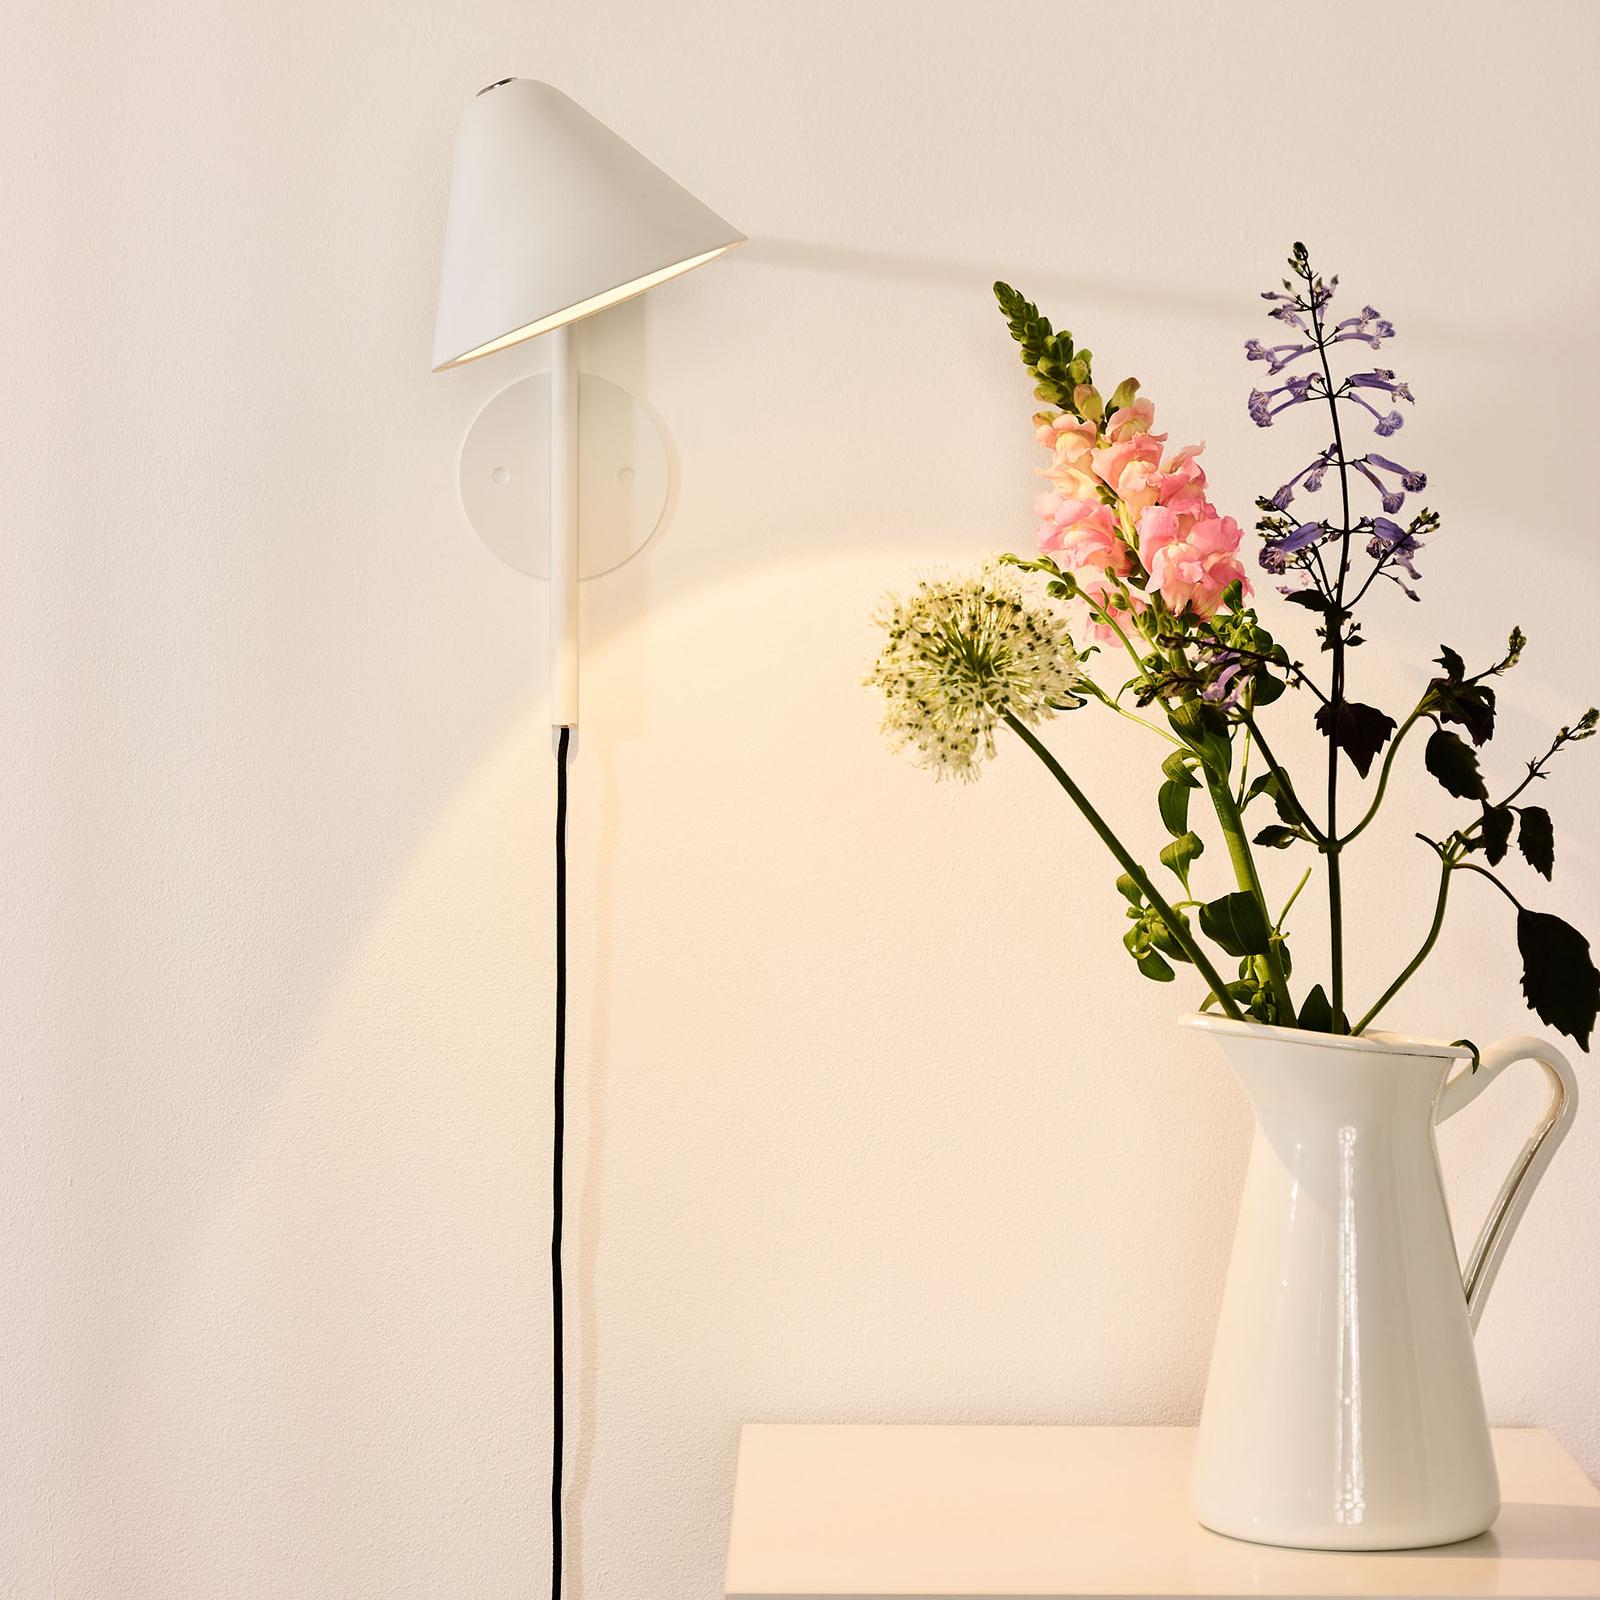 LED wandlamp Devon met stekker, wit